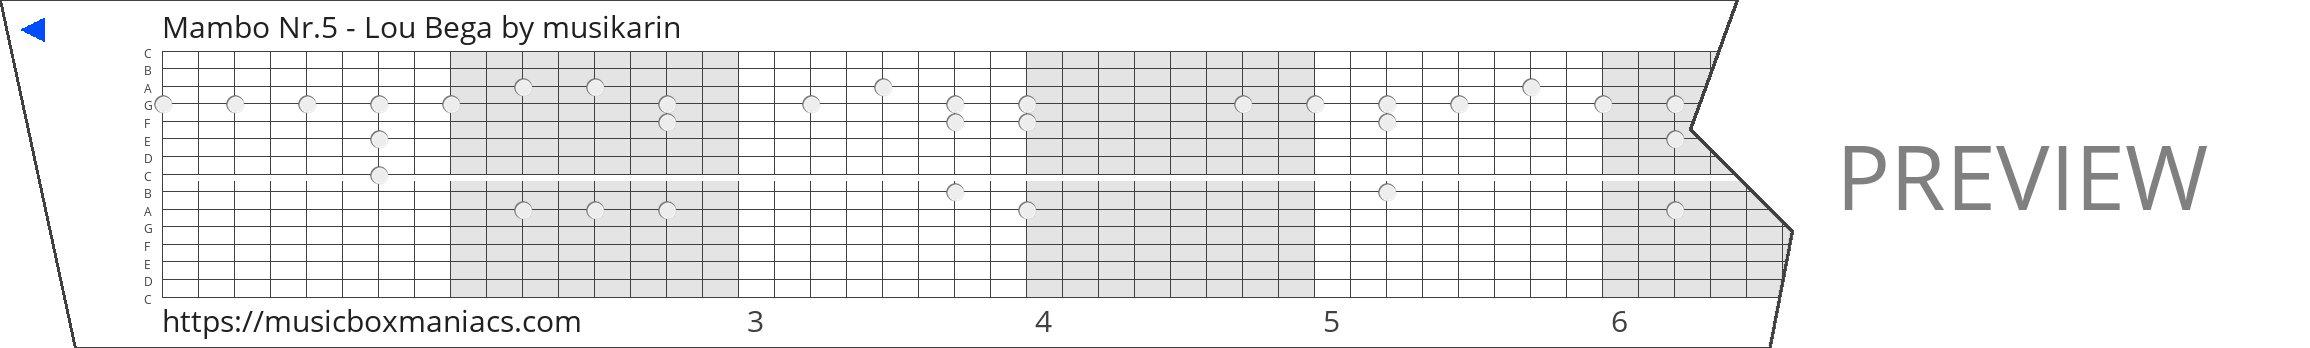 Mambo Nr.5 - Lou Bega 15 note music box paper strip